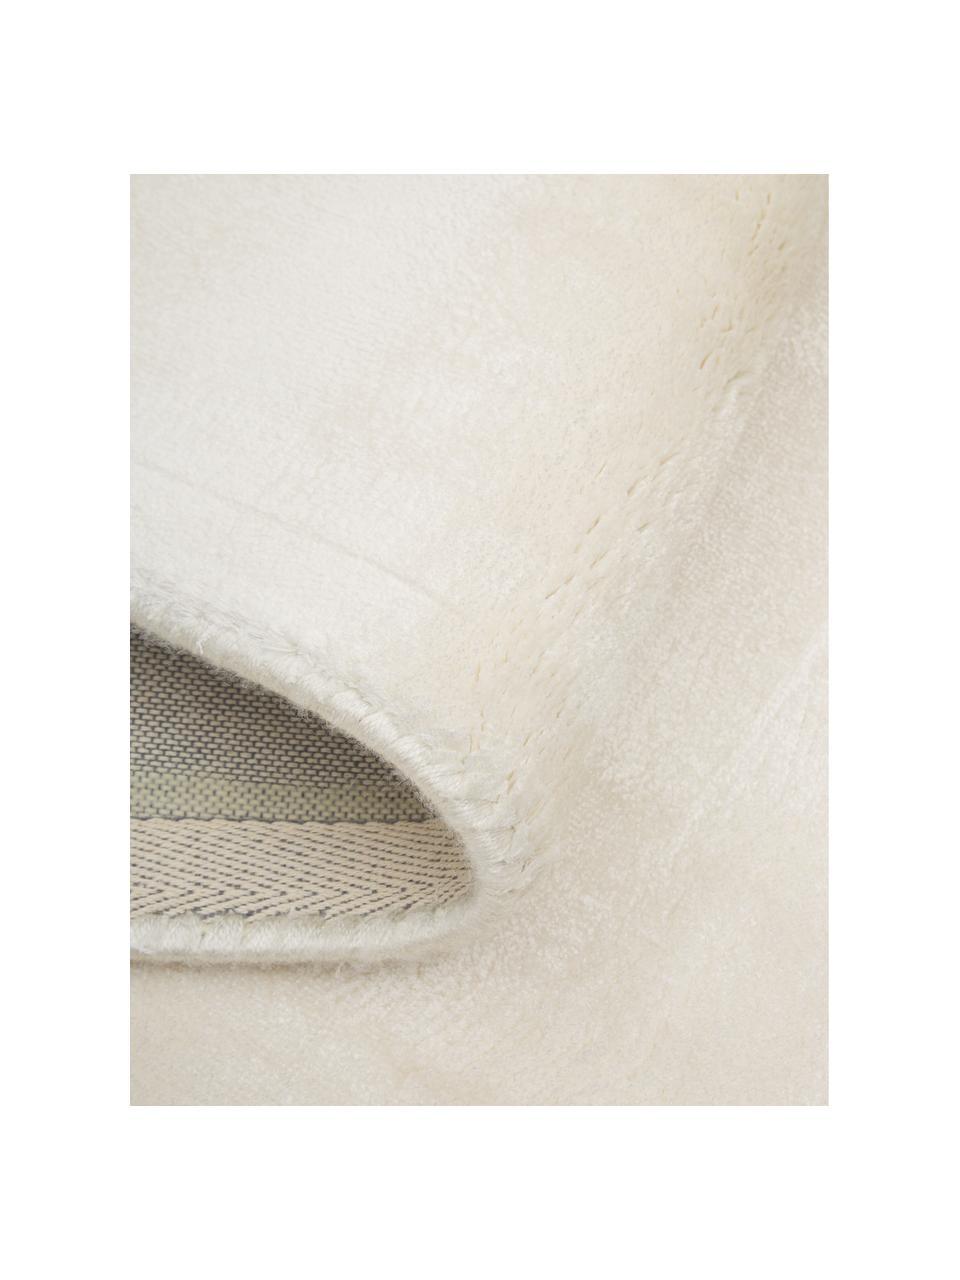 Glanzend viscose vloerkleed Grace in premium kwaliteit, extra zacht, Bovenzijde: 100% viscose, Onderzijde: 100% polyester, Crèmewit, B 80 x L 150 cm (maat XS)